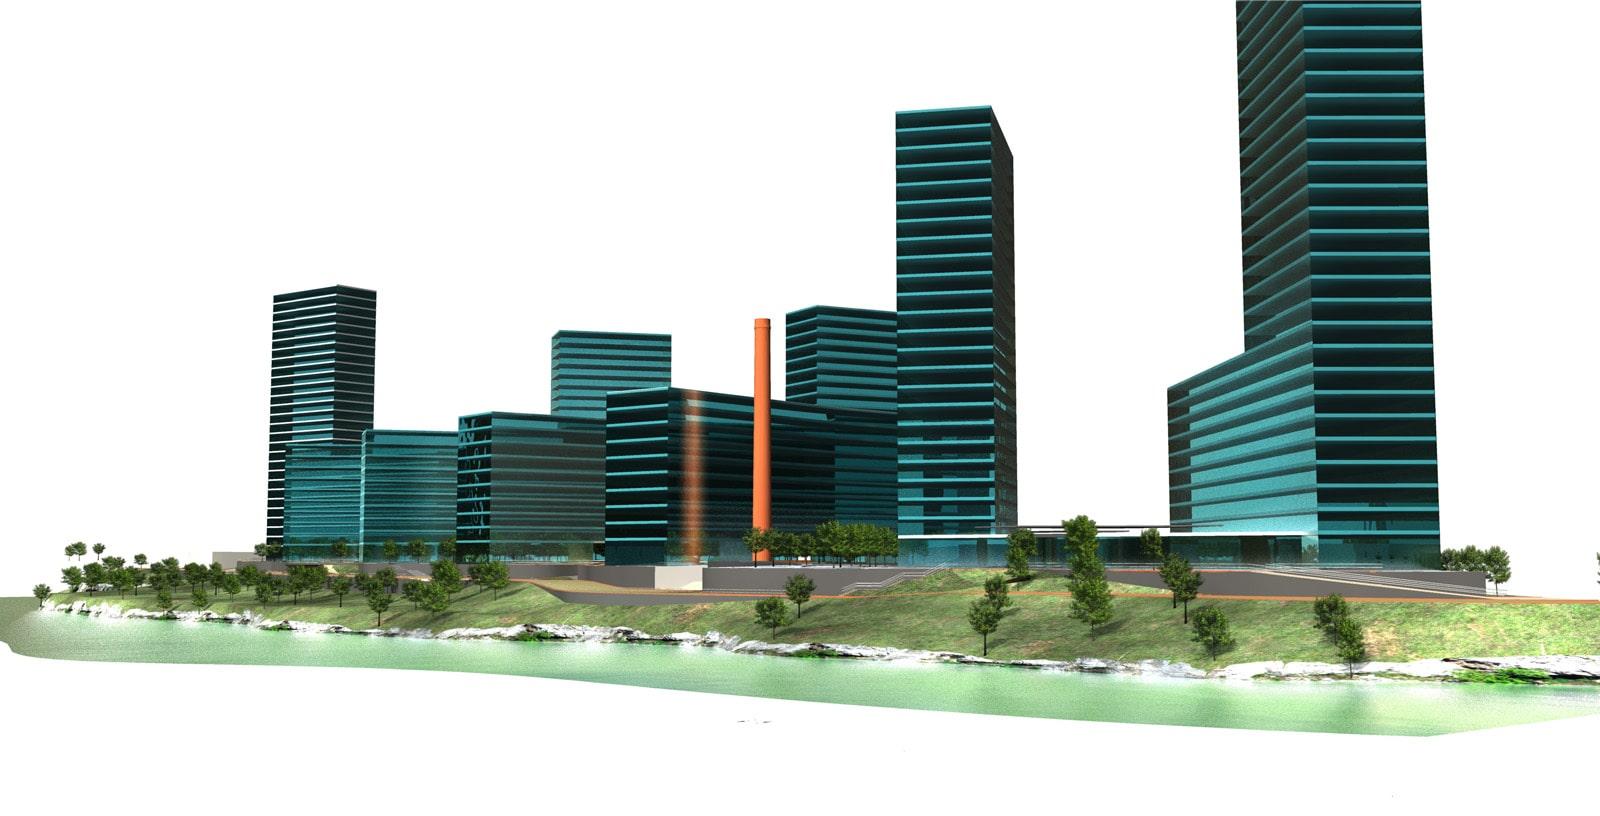 Bolueta_Bilbao_3_1_IDOM_Consultoria_Propiedad